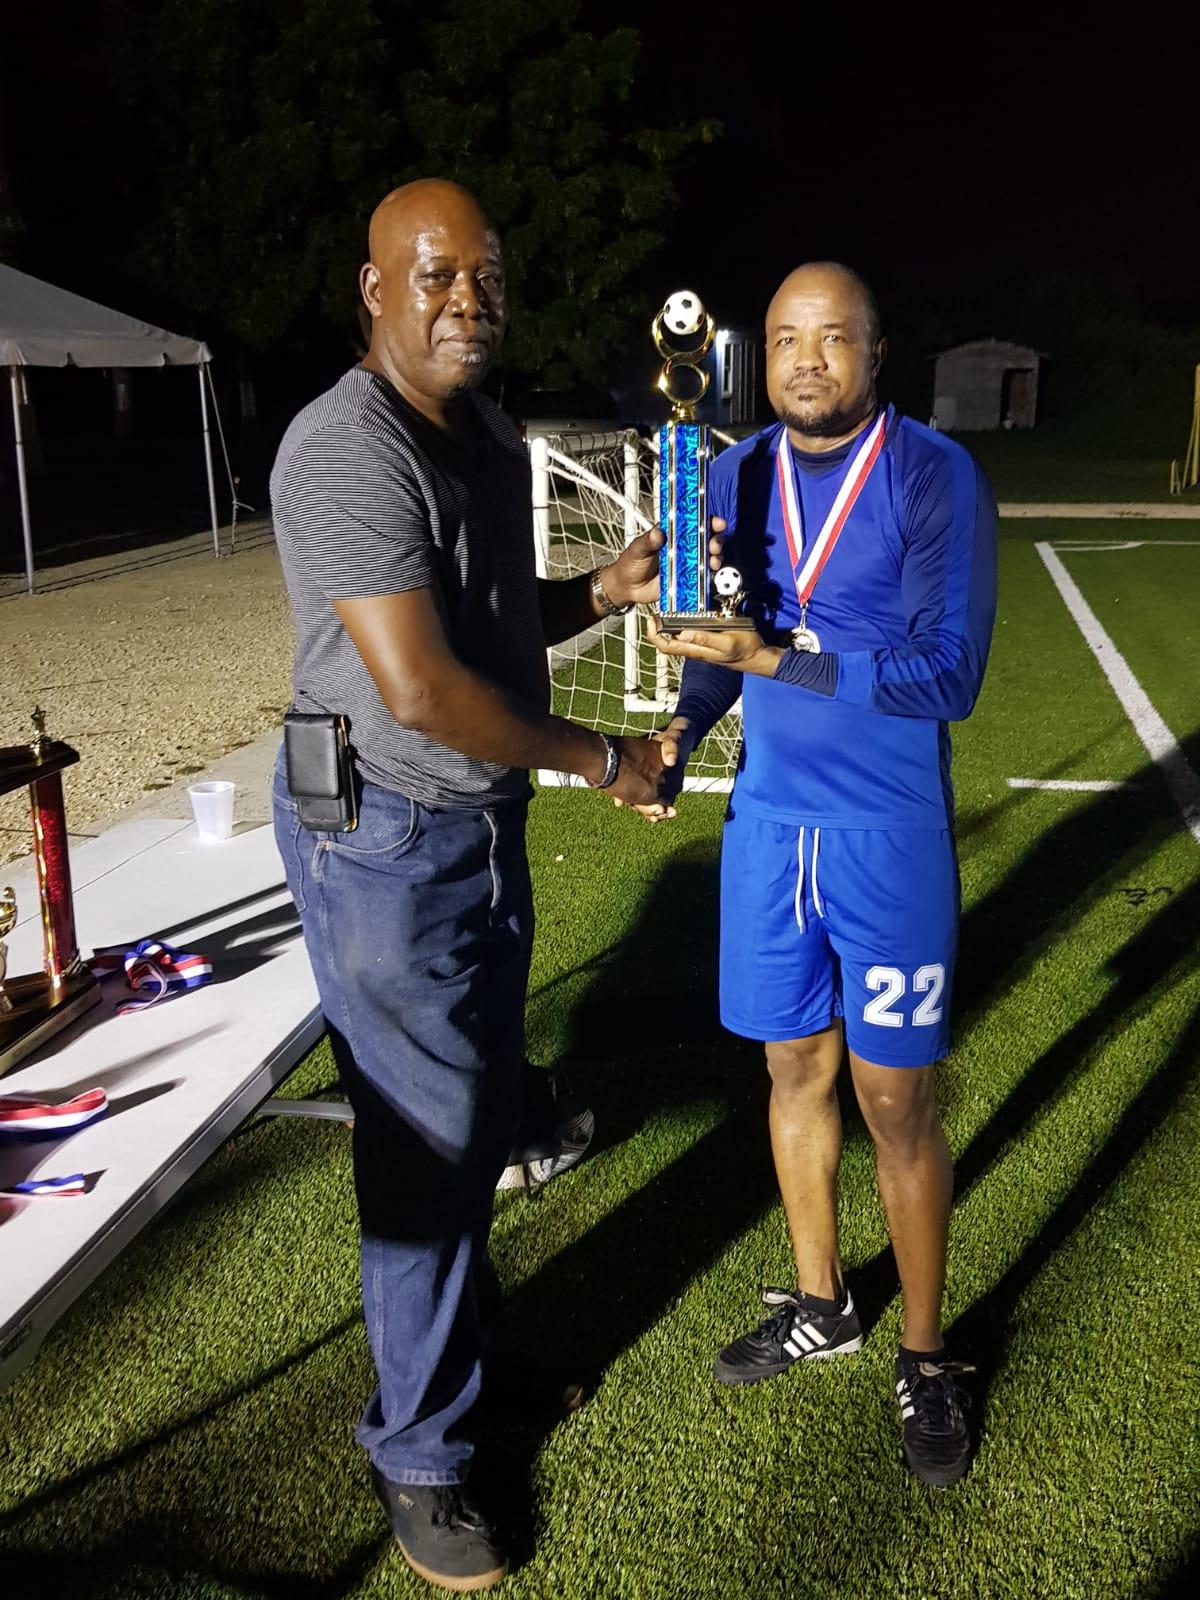 Inspector Joe Wright secured the MVP trophy